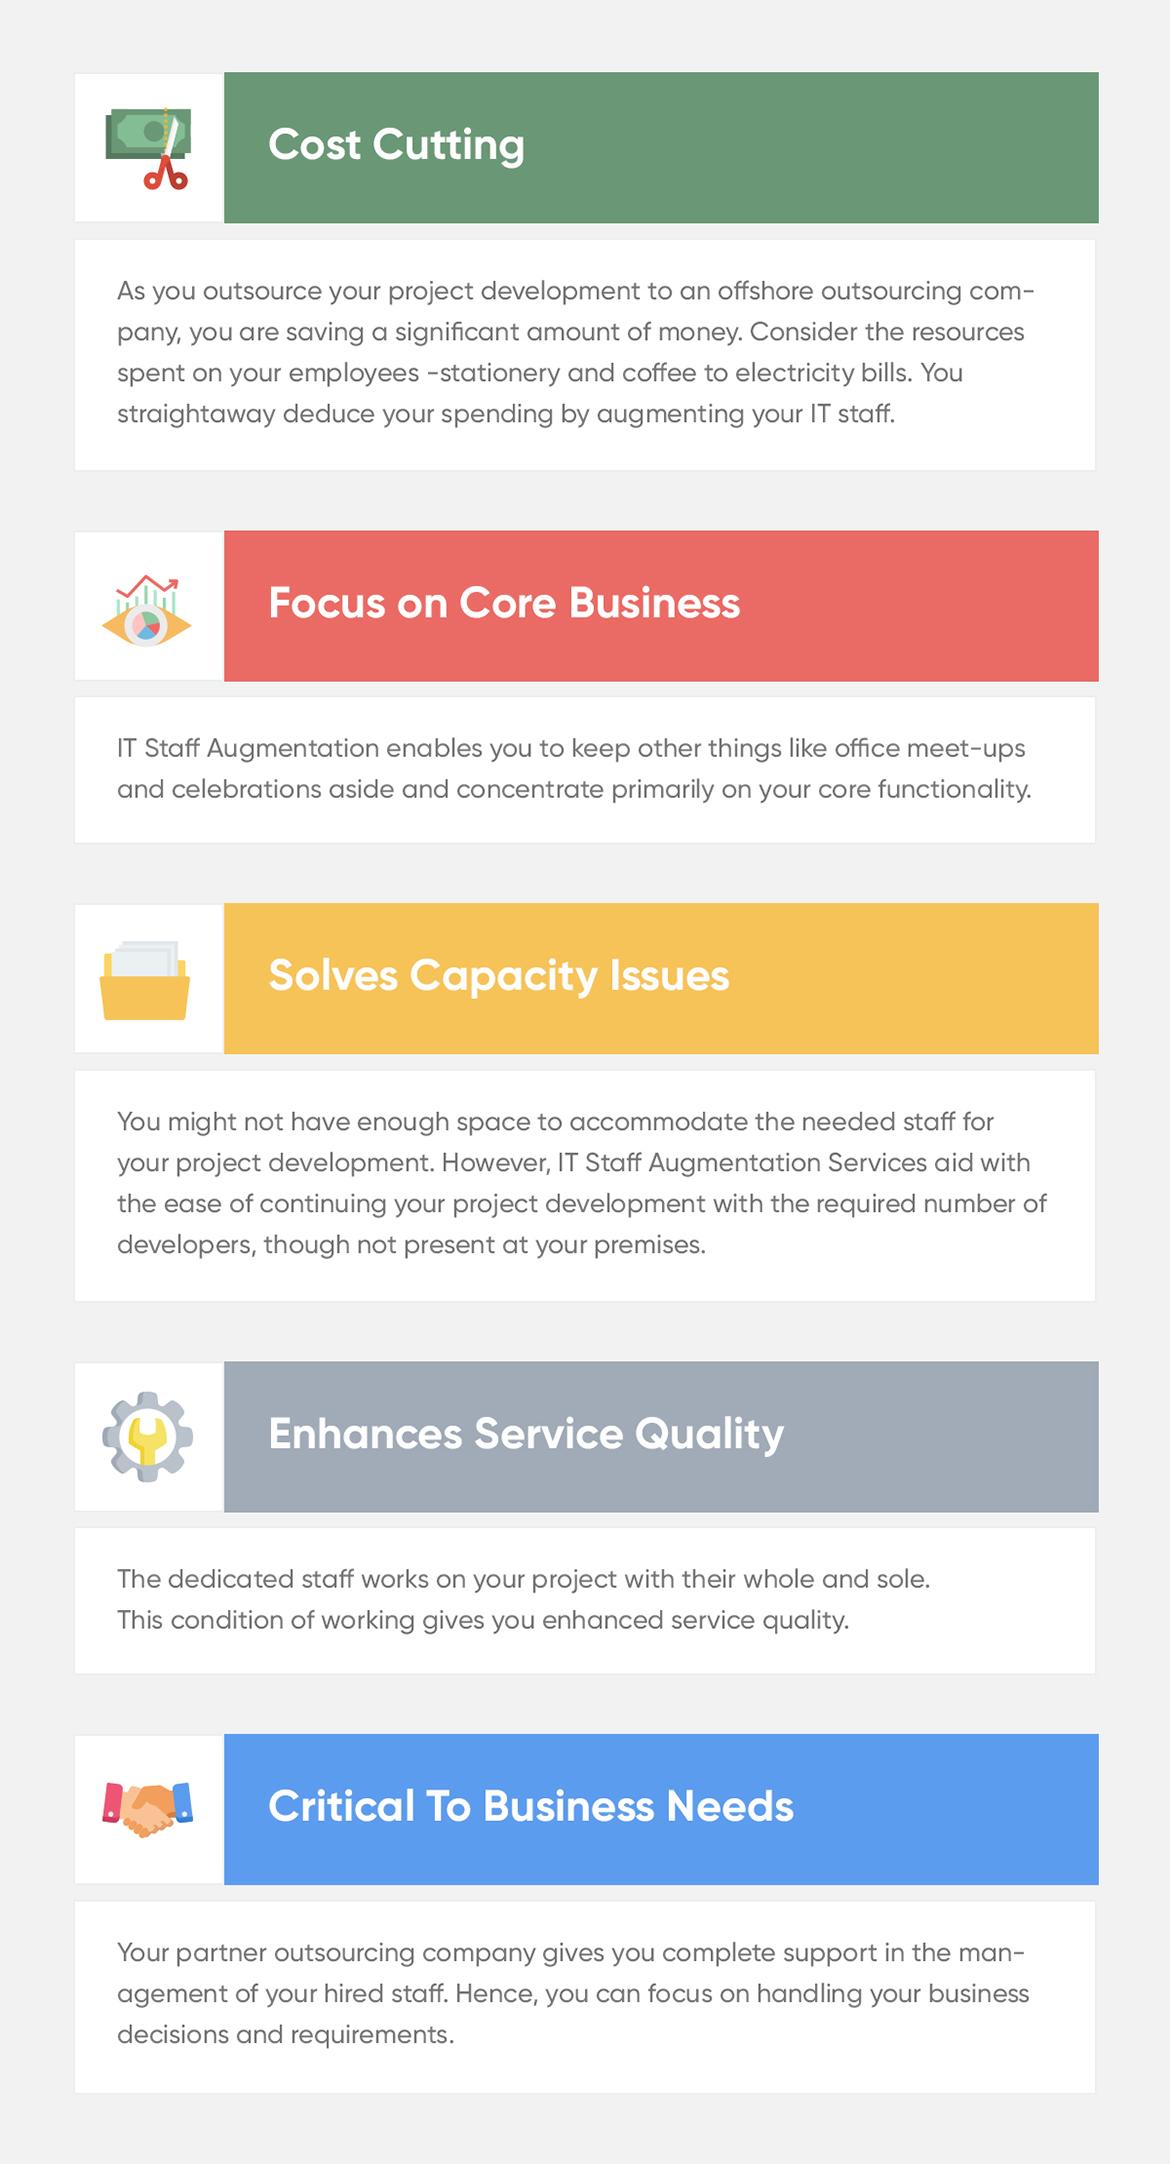 Choose IT Staff Augmentation Services